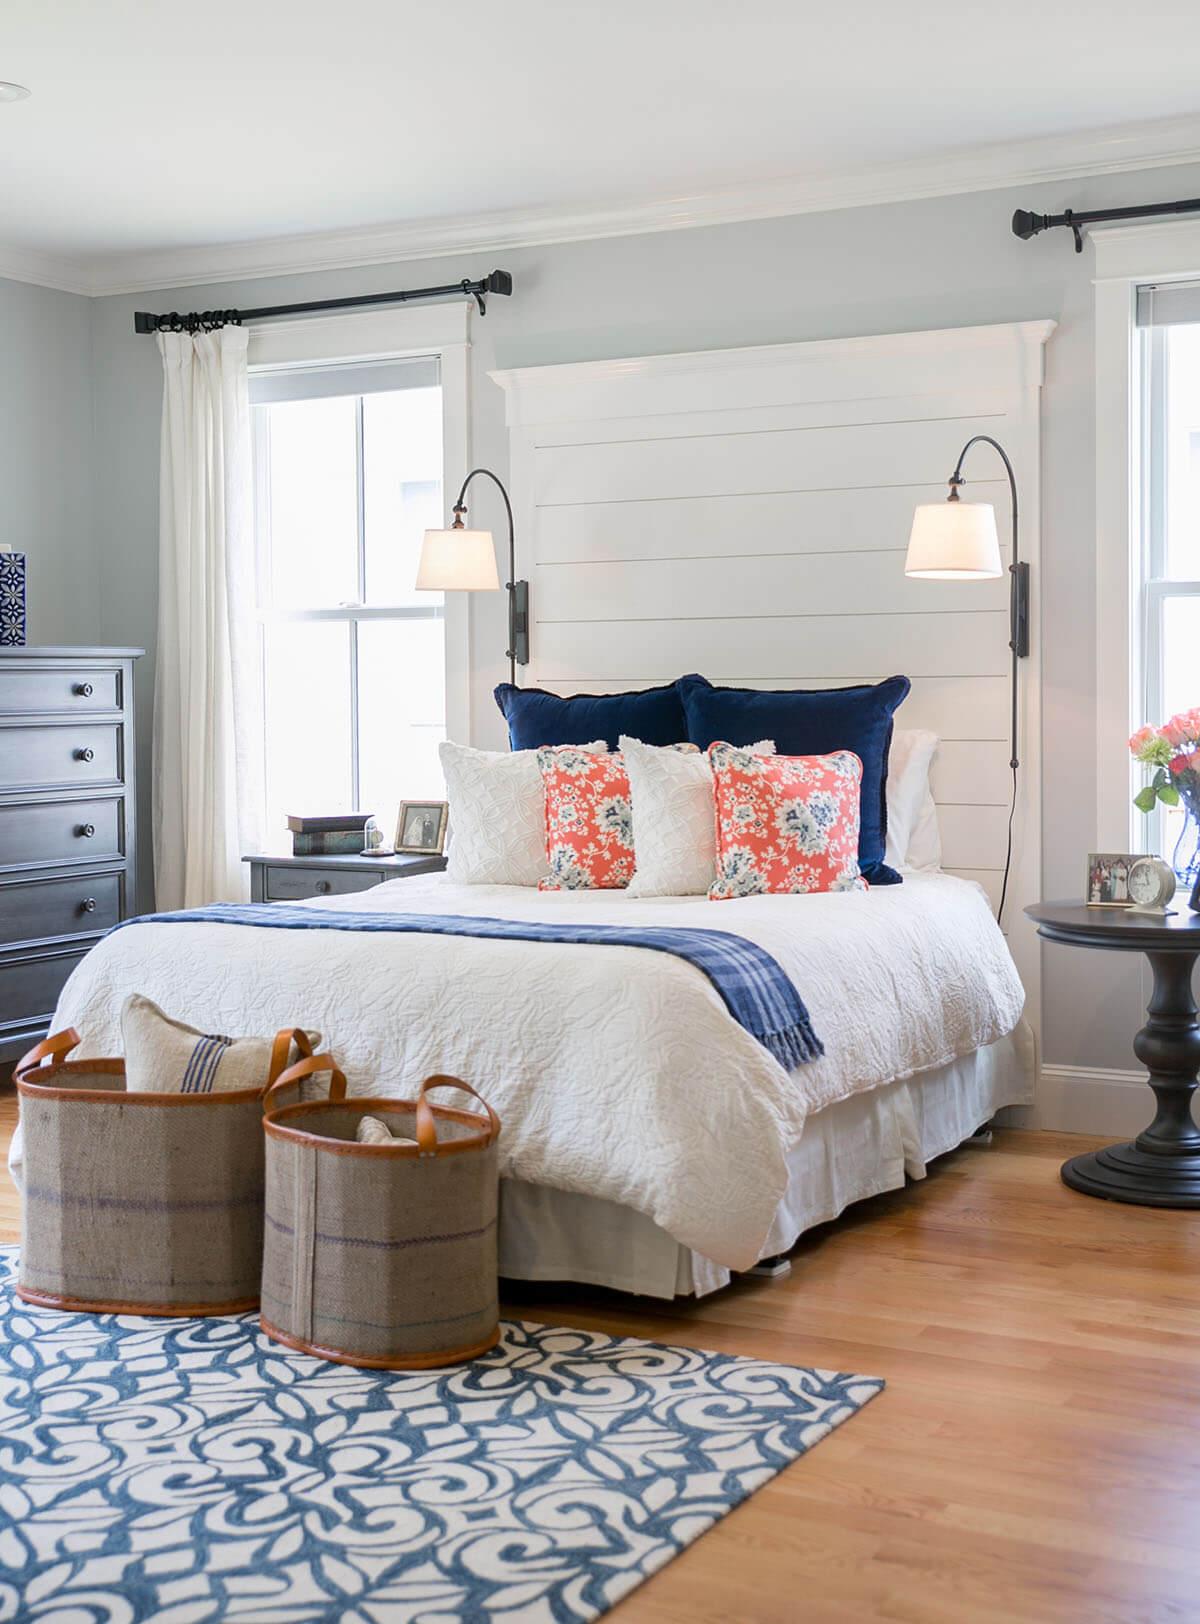 32 Best Beach House Interior Design Ideas and Decorations ... on House Interior Ideas  id=61491